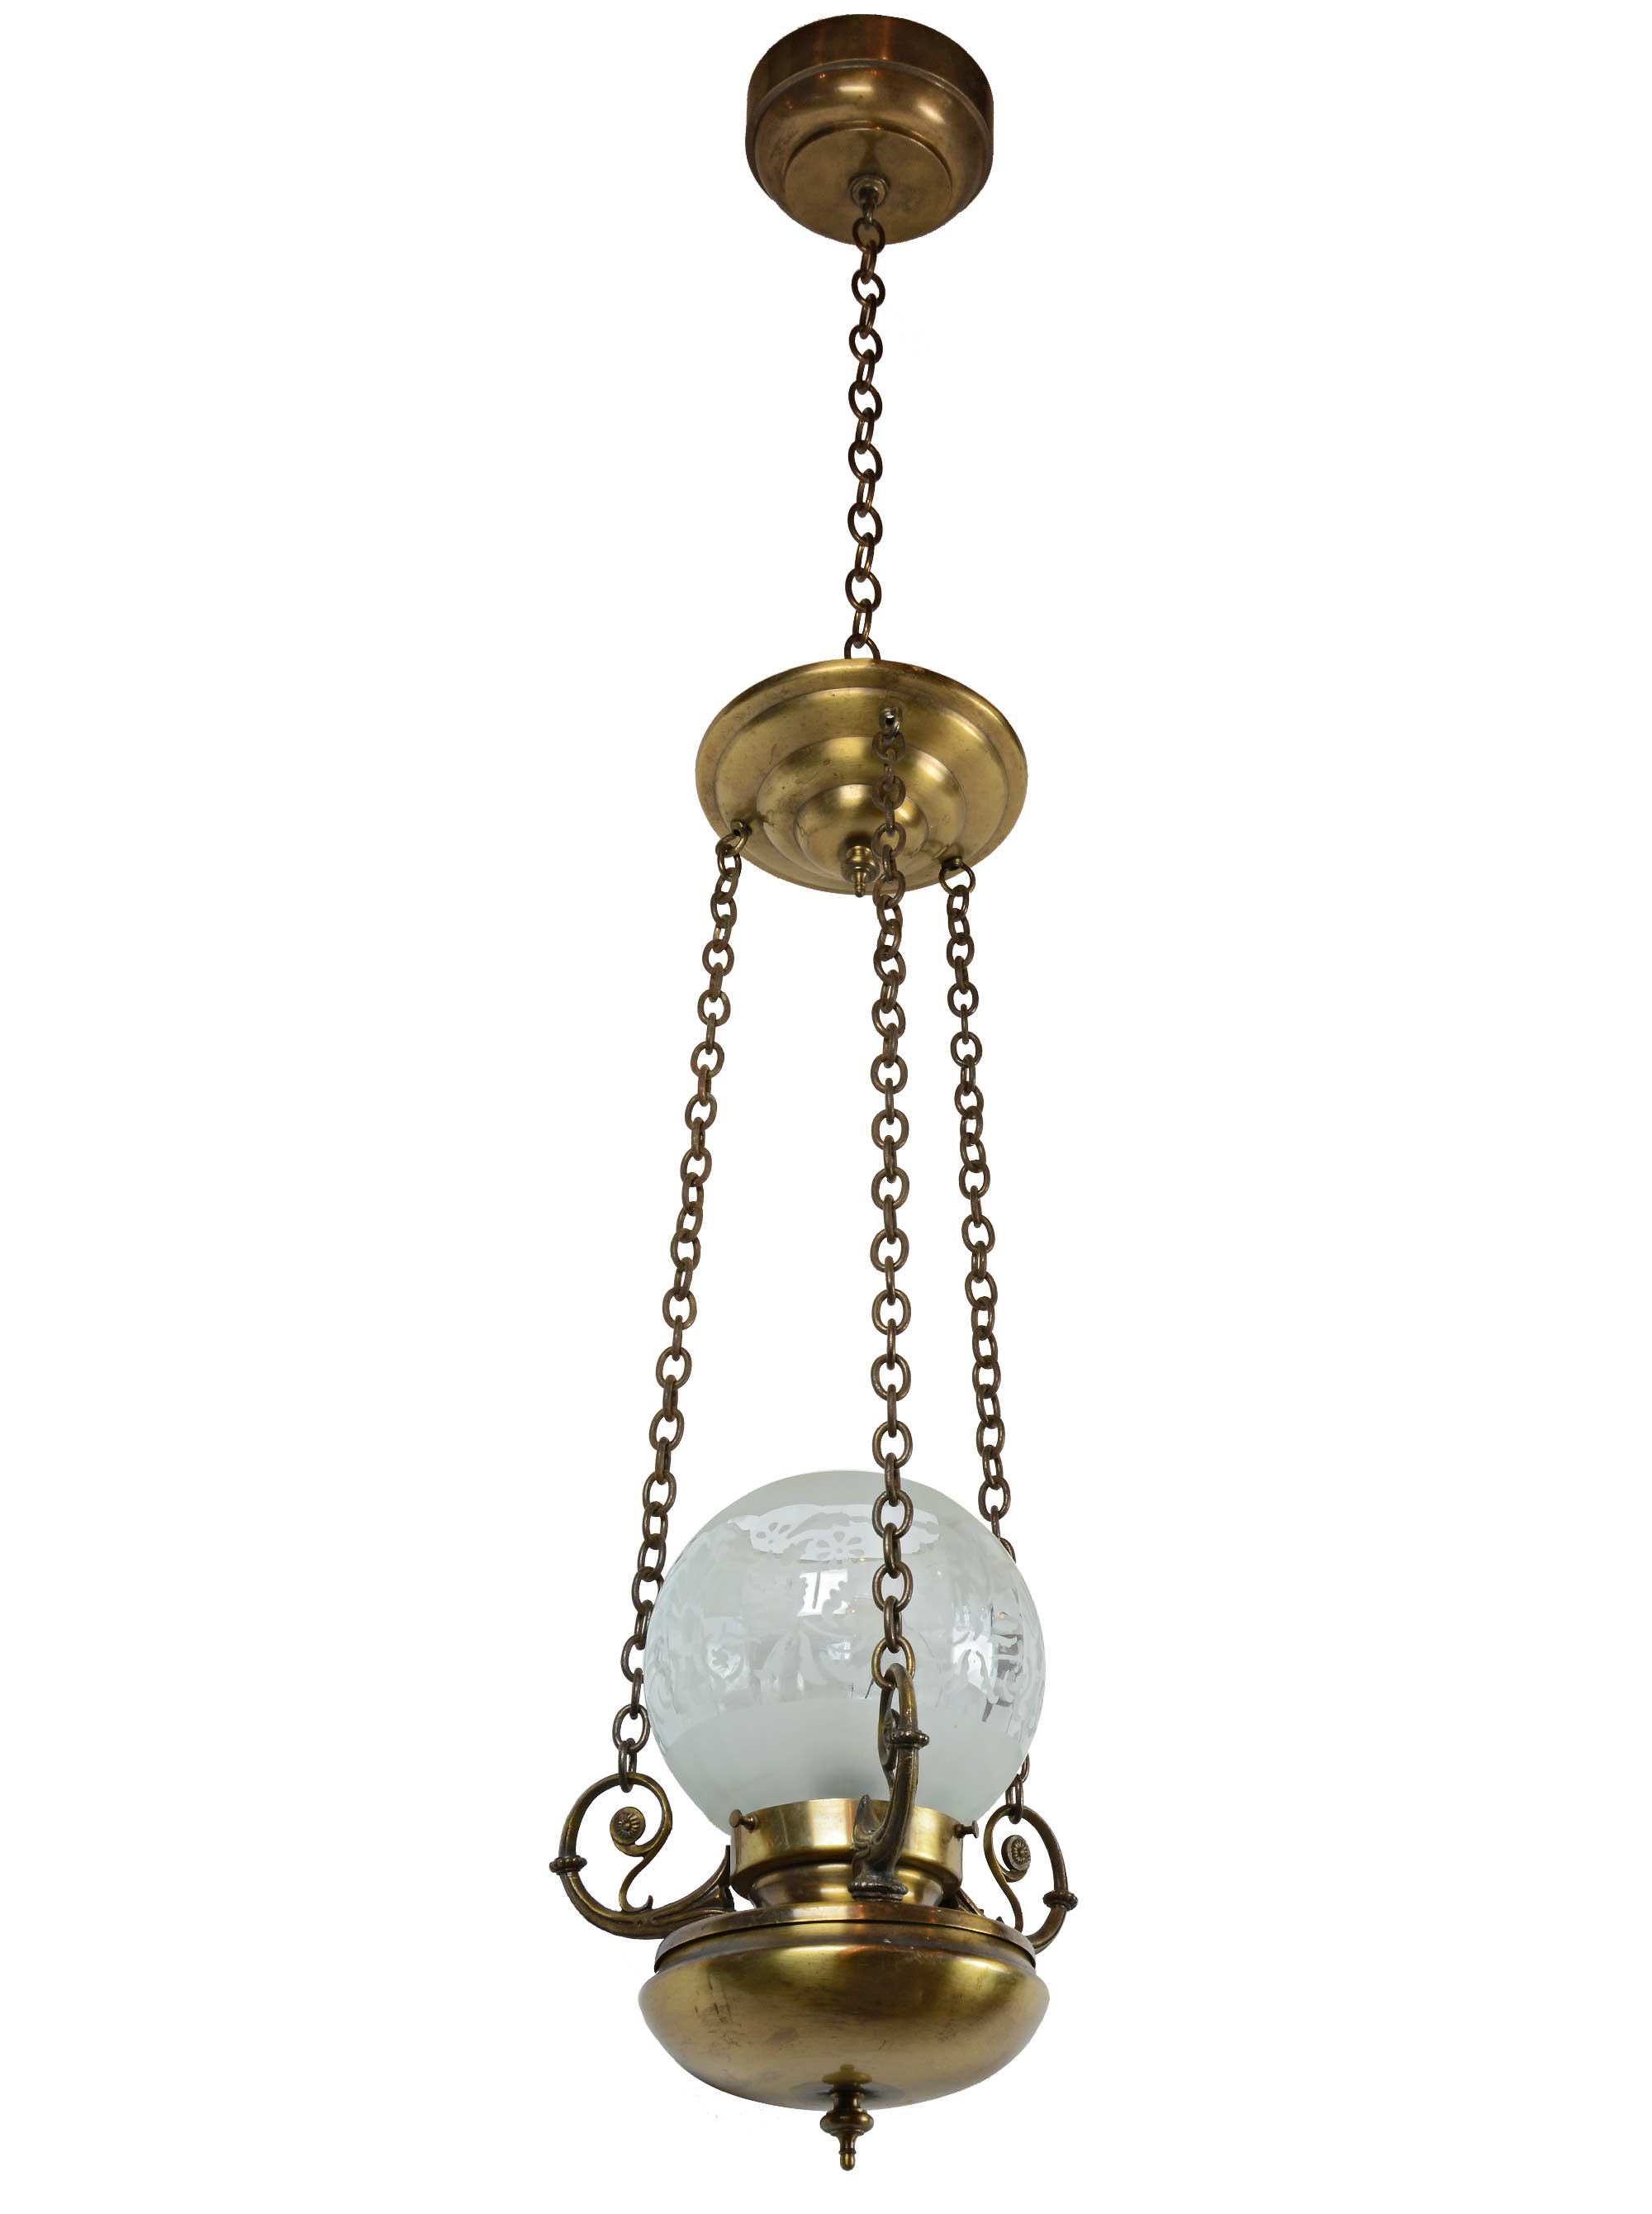 46814-brass-3-chain-neoclassical-pendant-angle.jpg